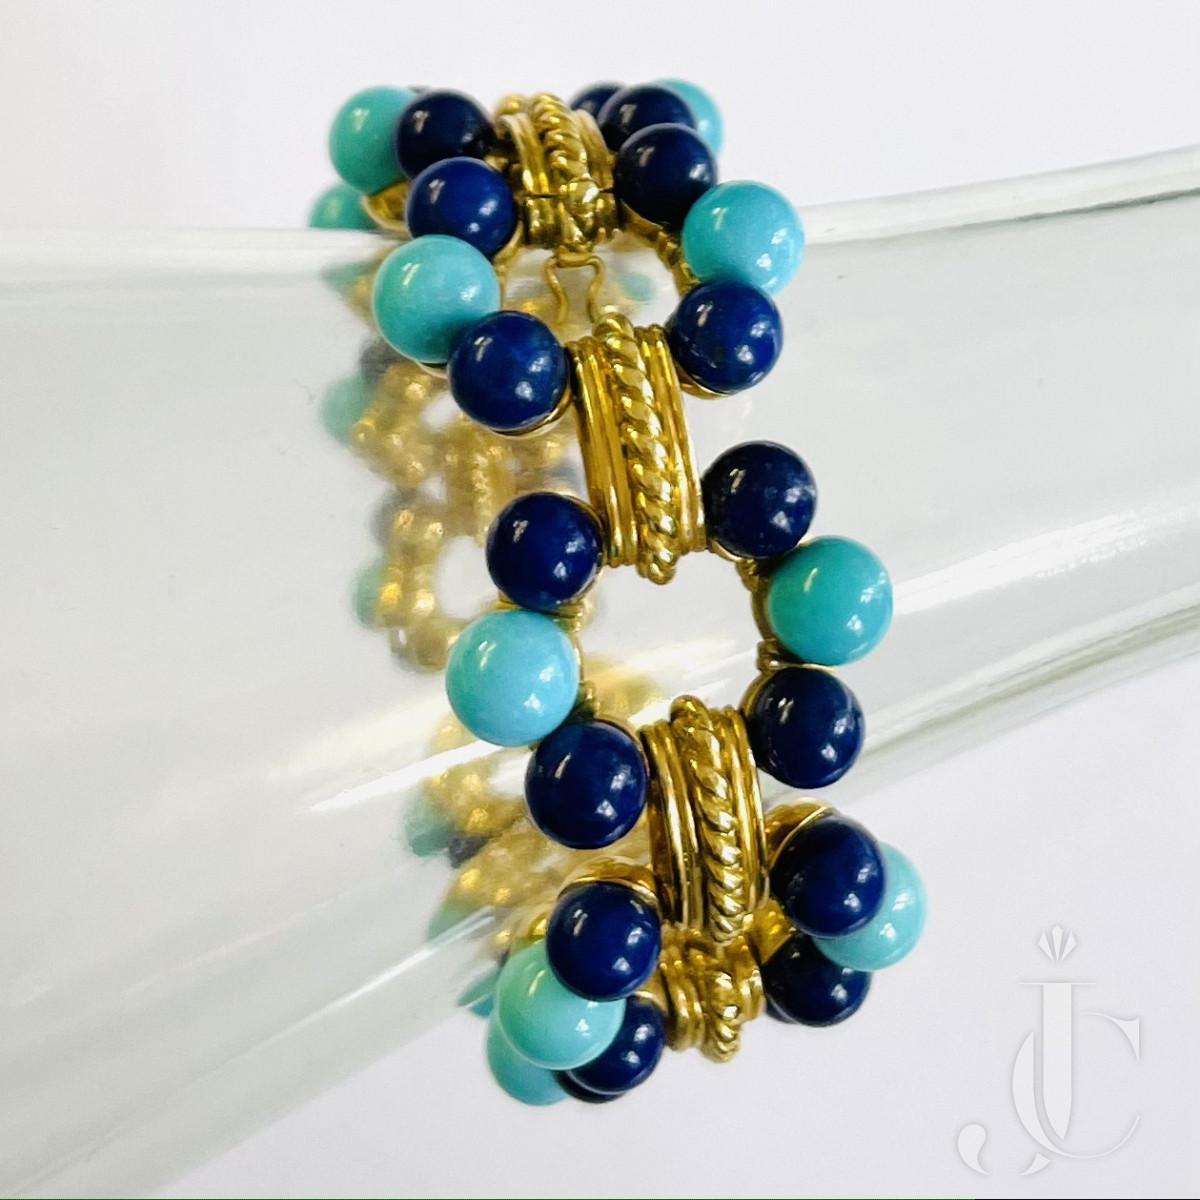 René Kern Turquoise and Lapis Bracelet